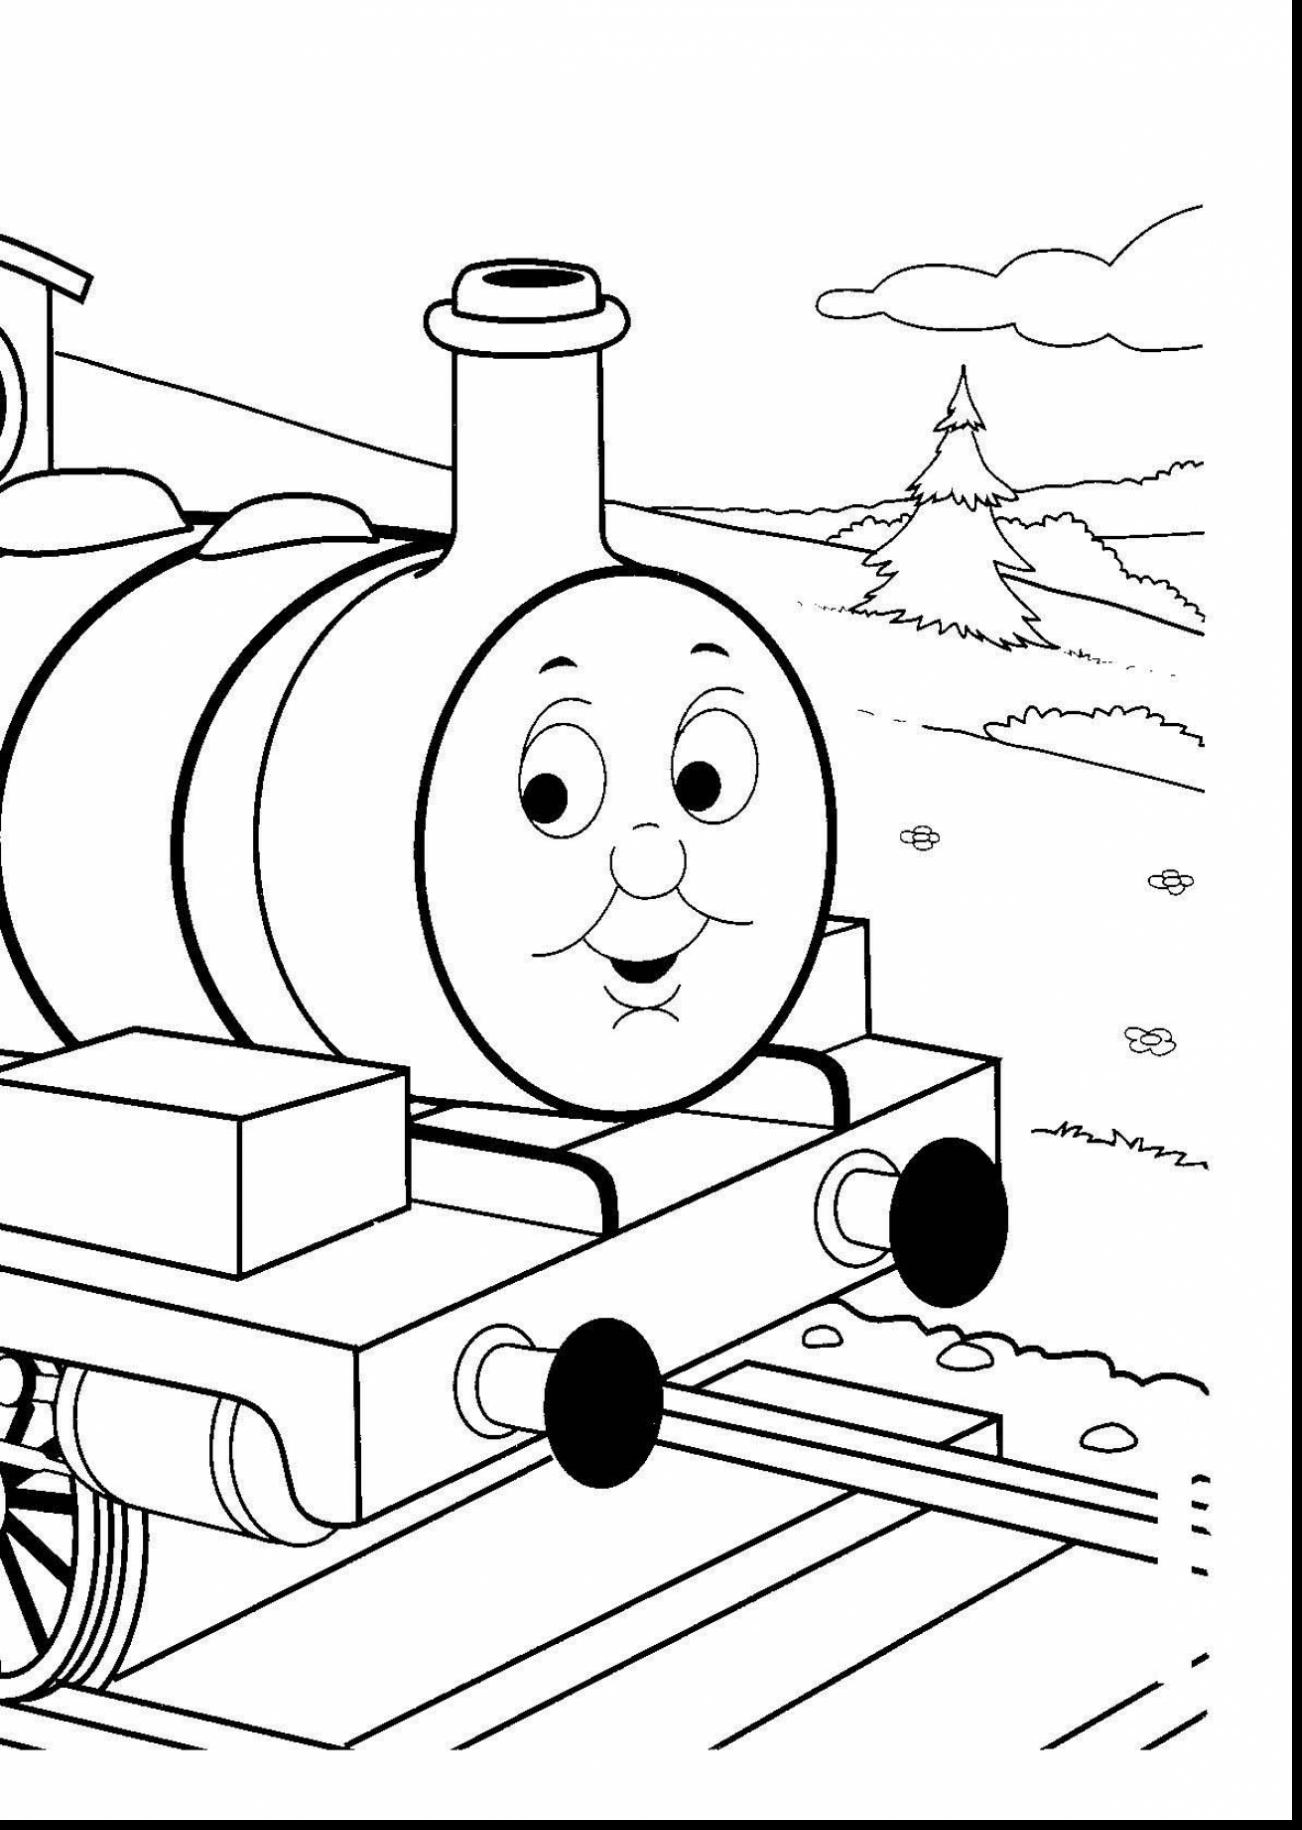 Thomas Train Drawing At Getdrawings | Free Download concernant Dessin Animé Train Thomas